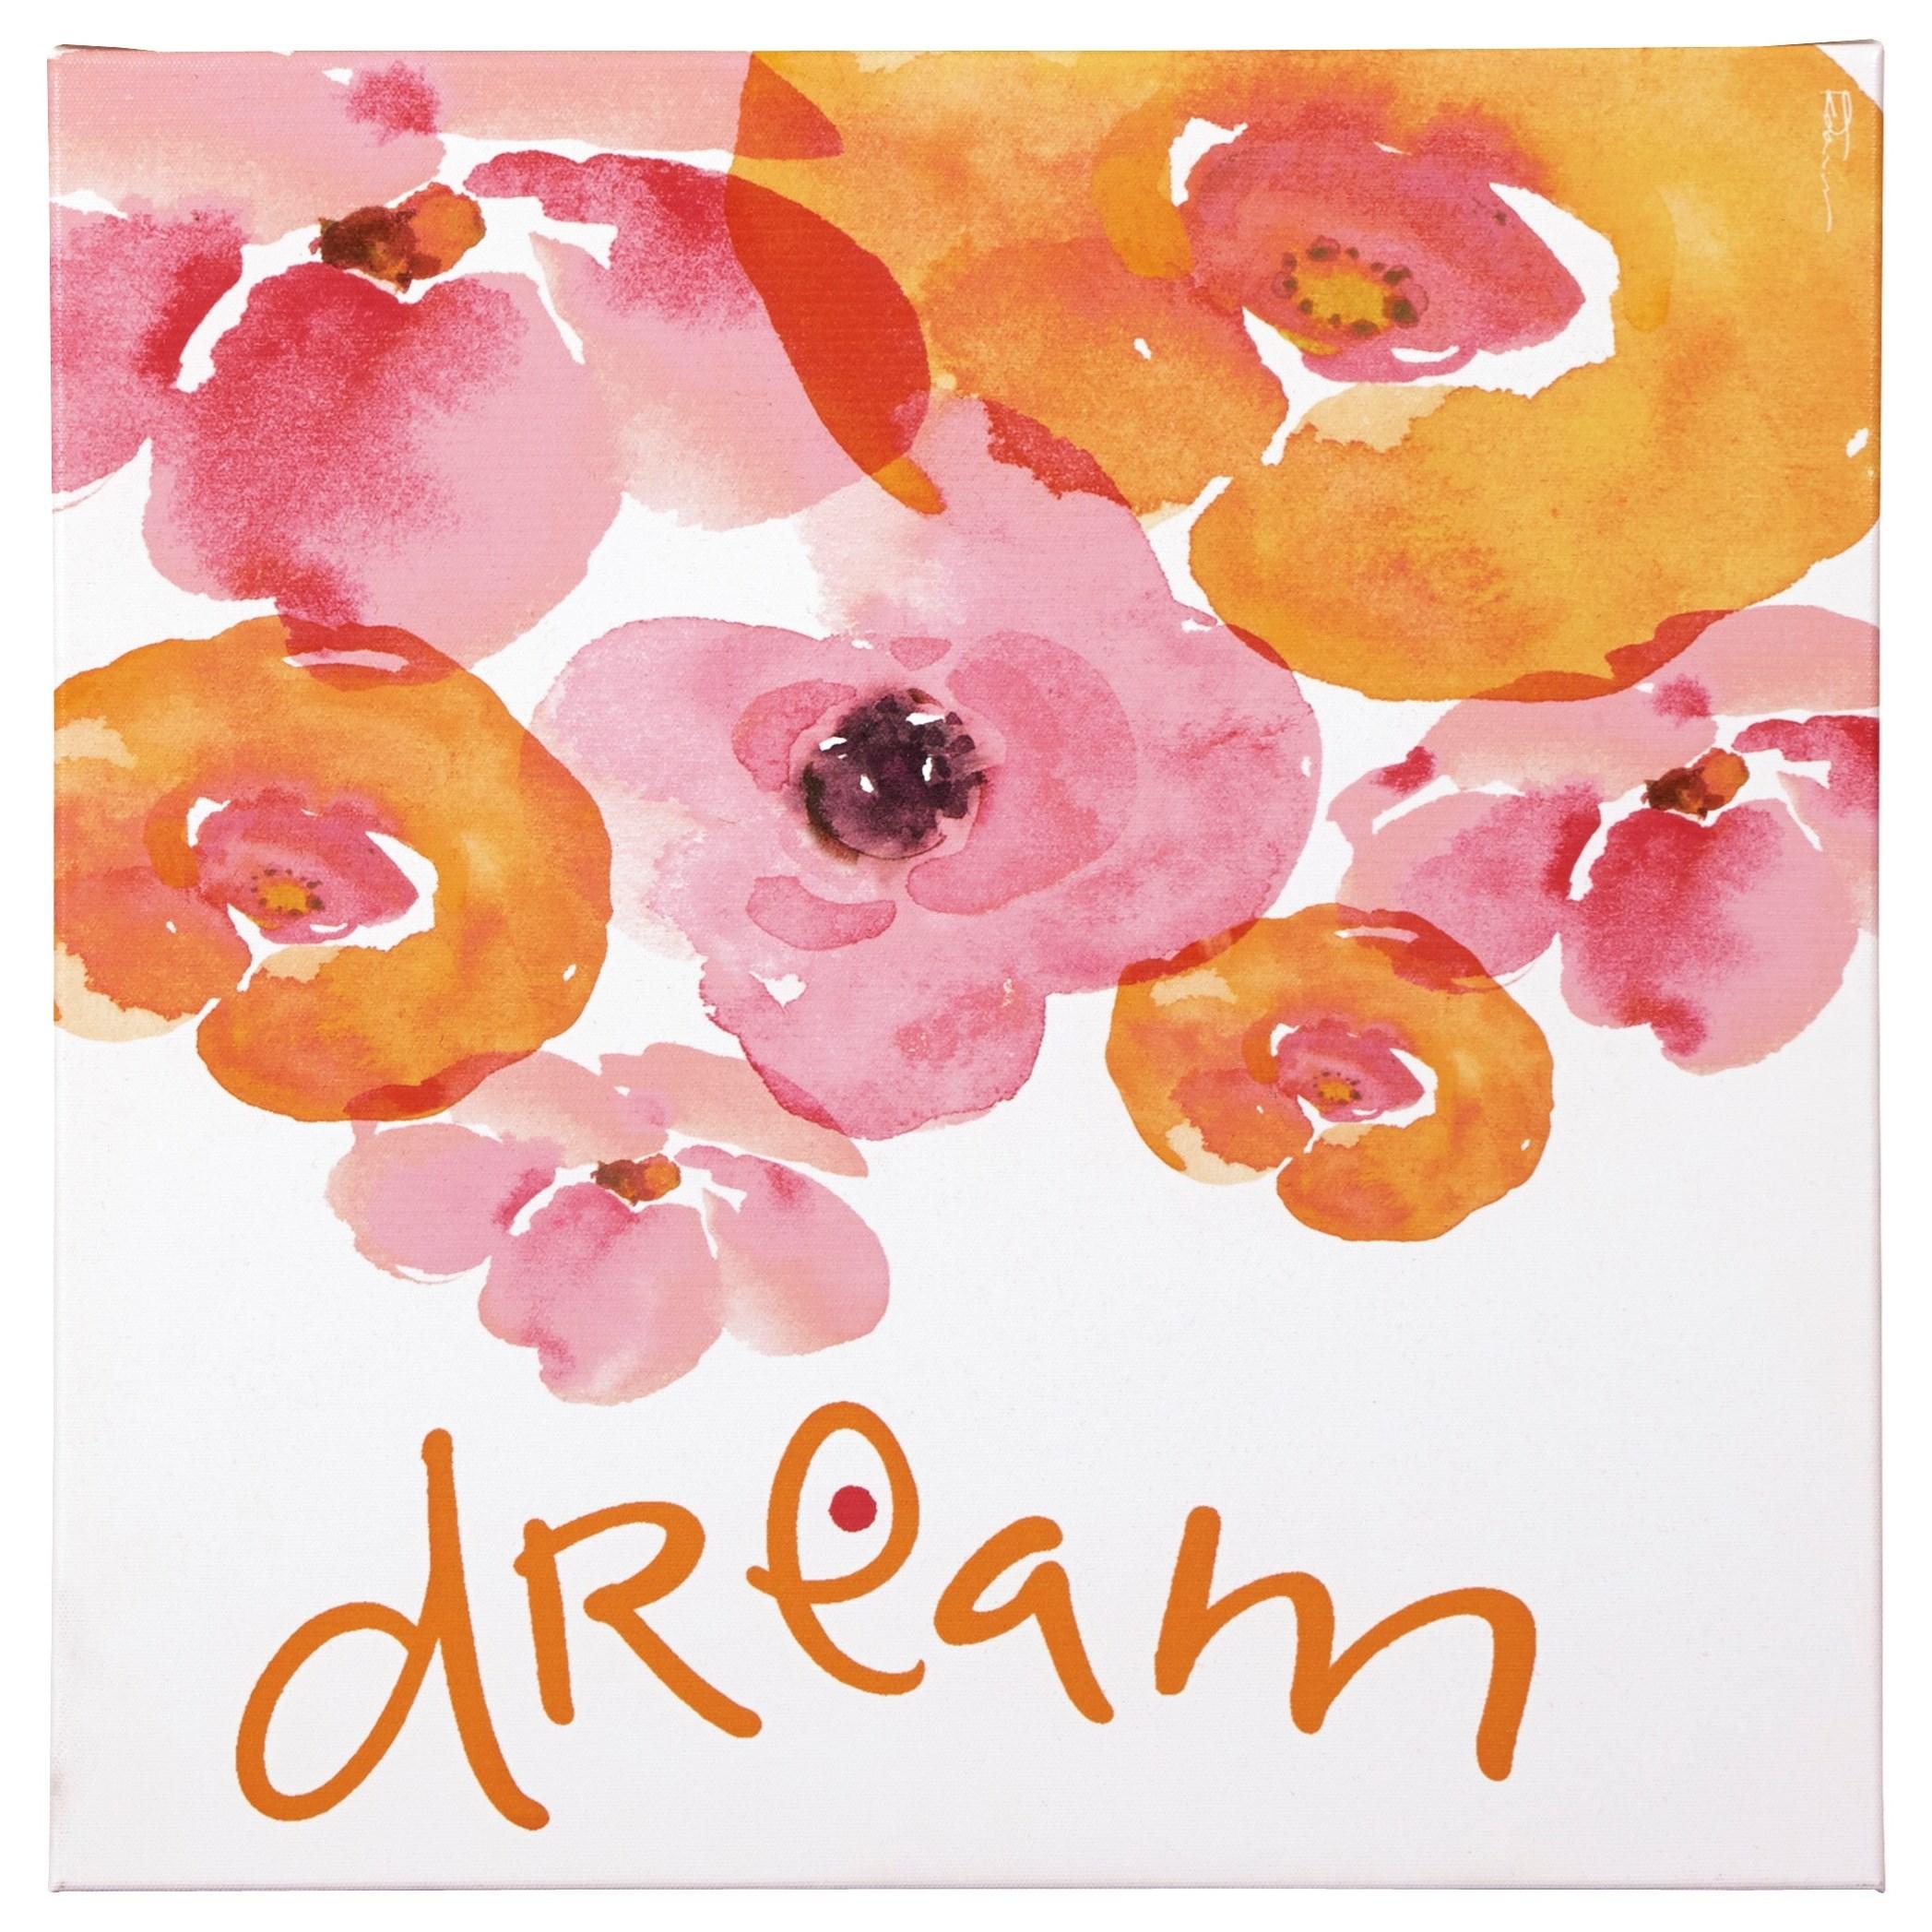 Signature Design by Ashley Wall Art Jachai Pink/Orange/White Wall Art - Item Number: A8000163